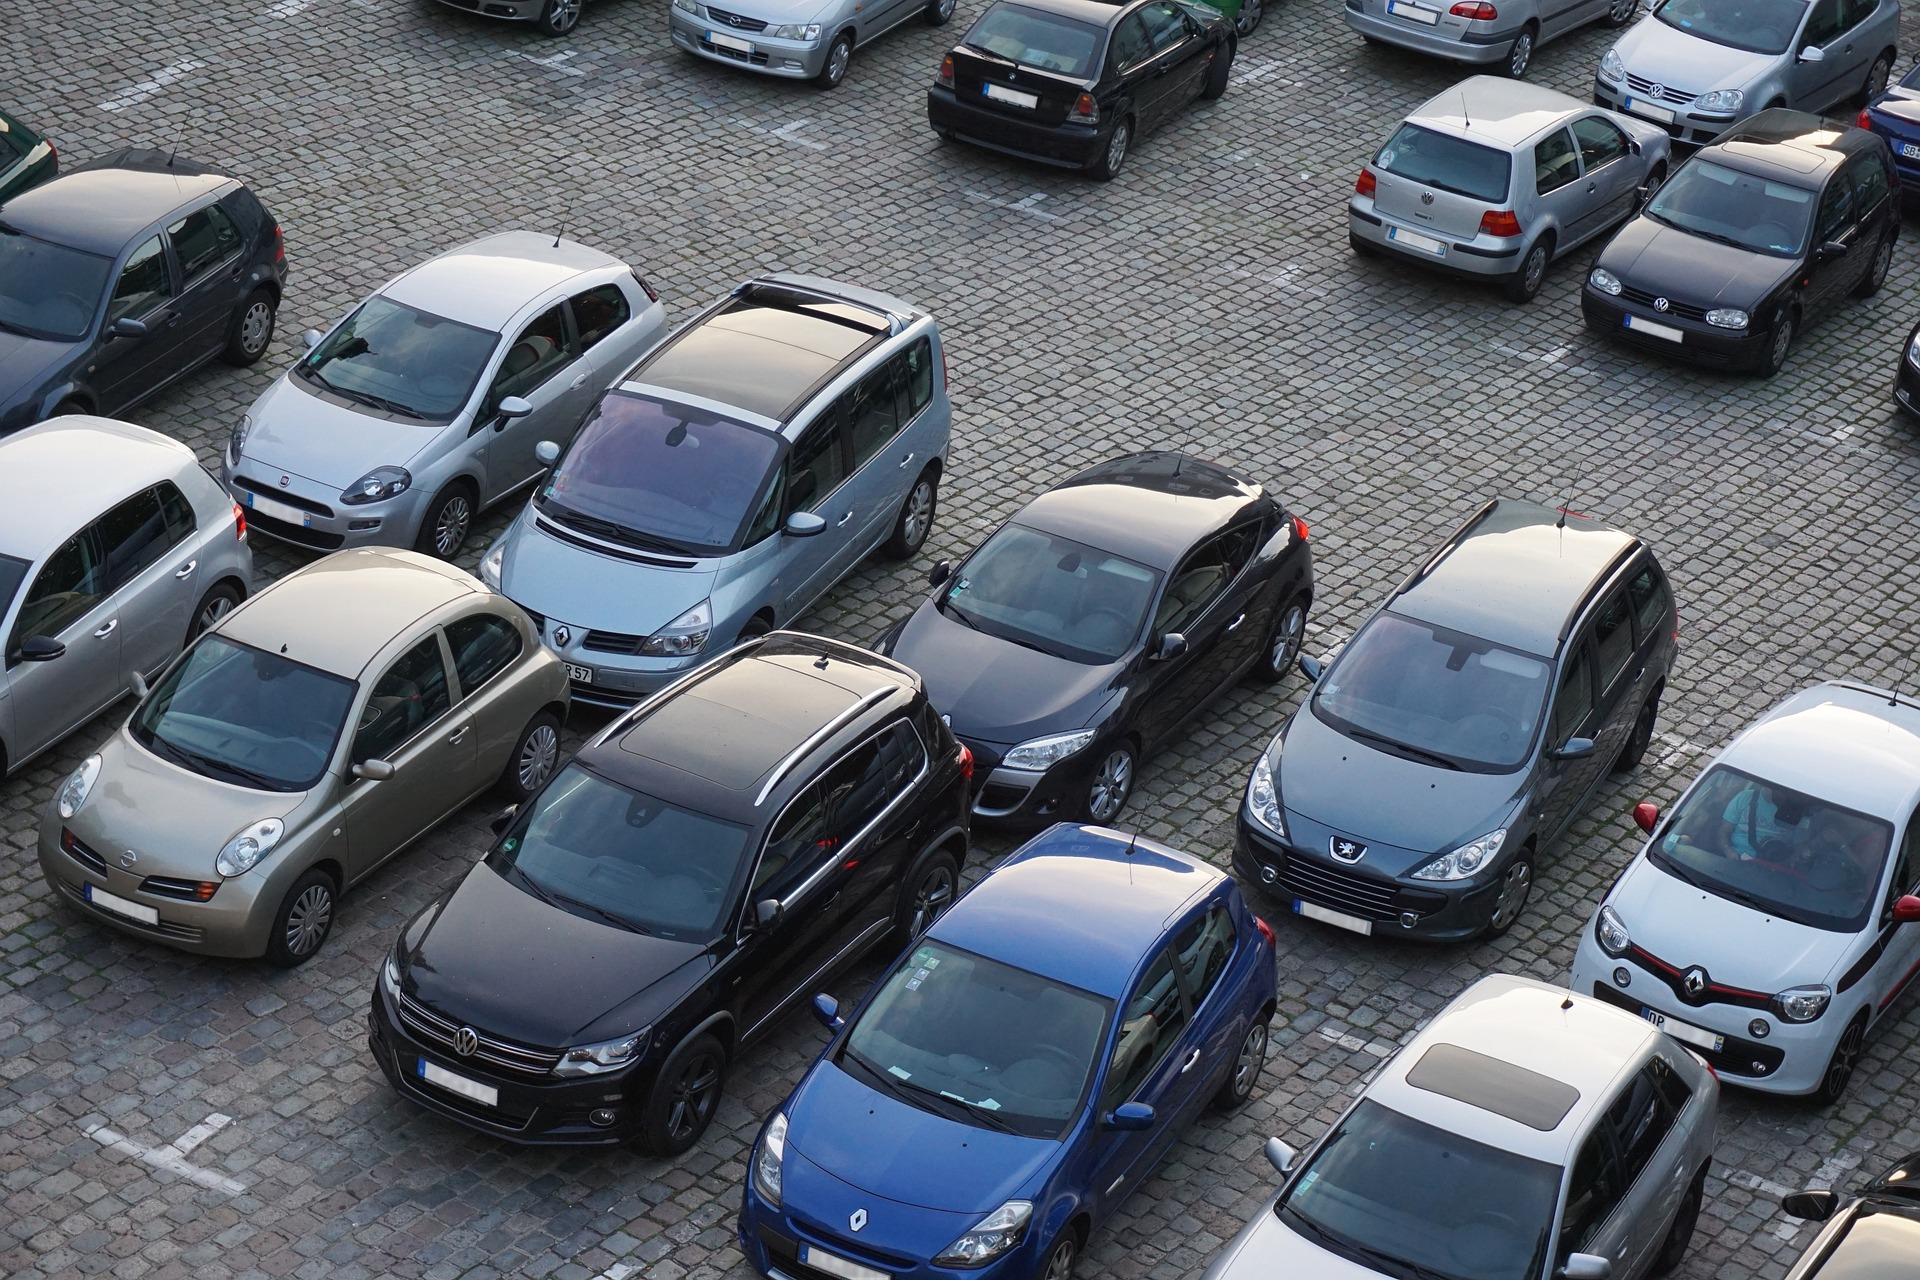 Got Parking? - Parking, SpotHero, Chicago